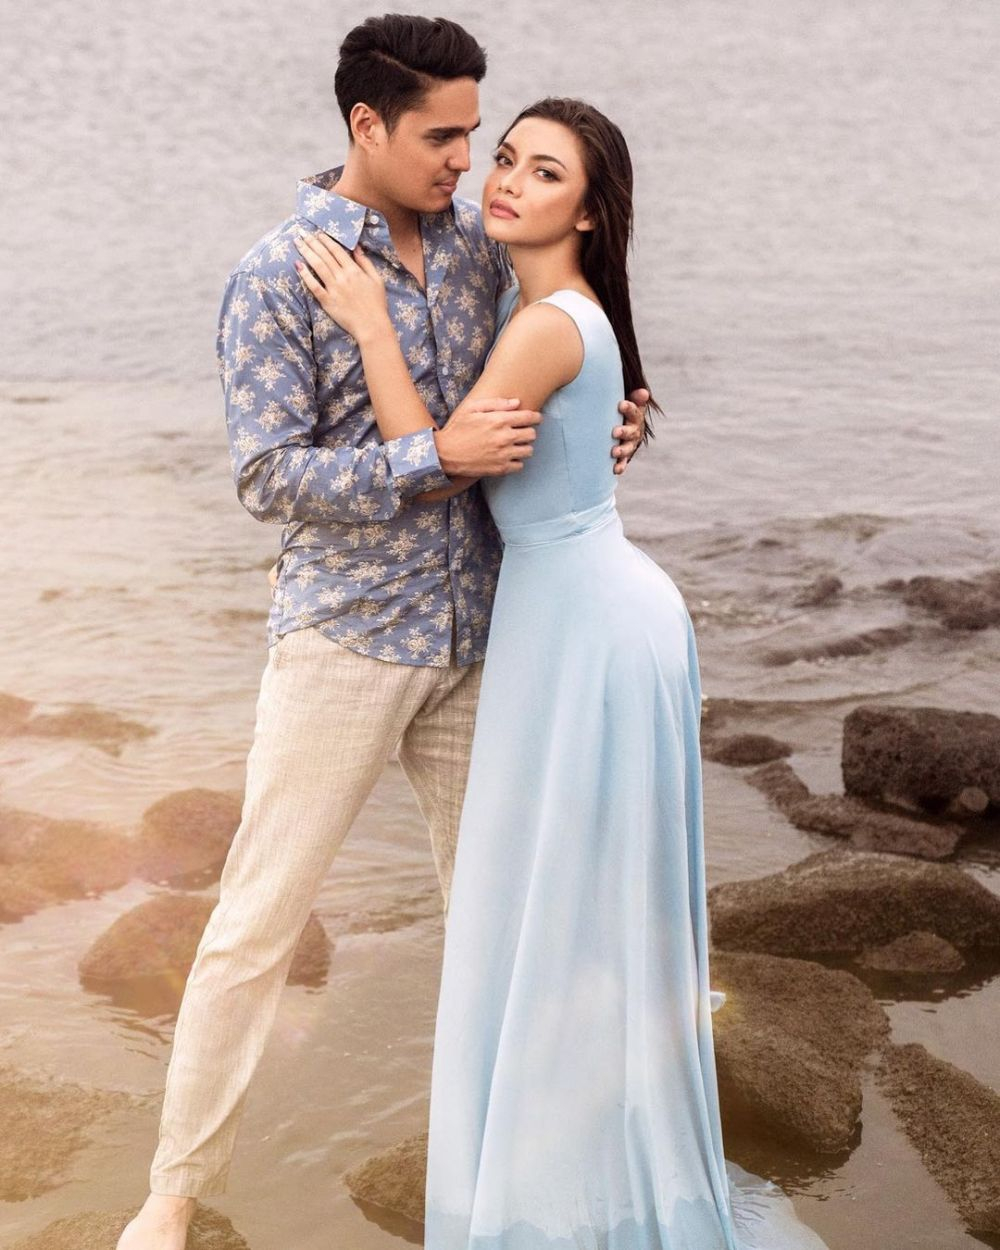 Angela Gilsha & Mischa di pantai © Instagram